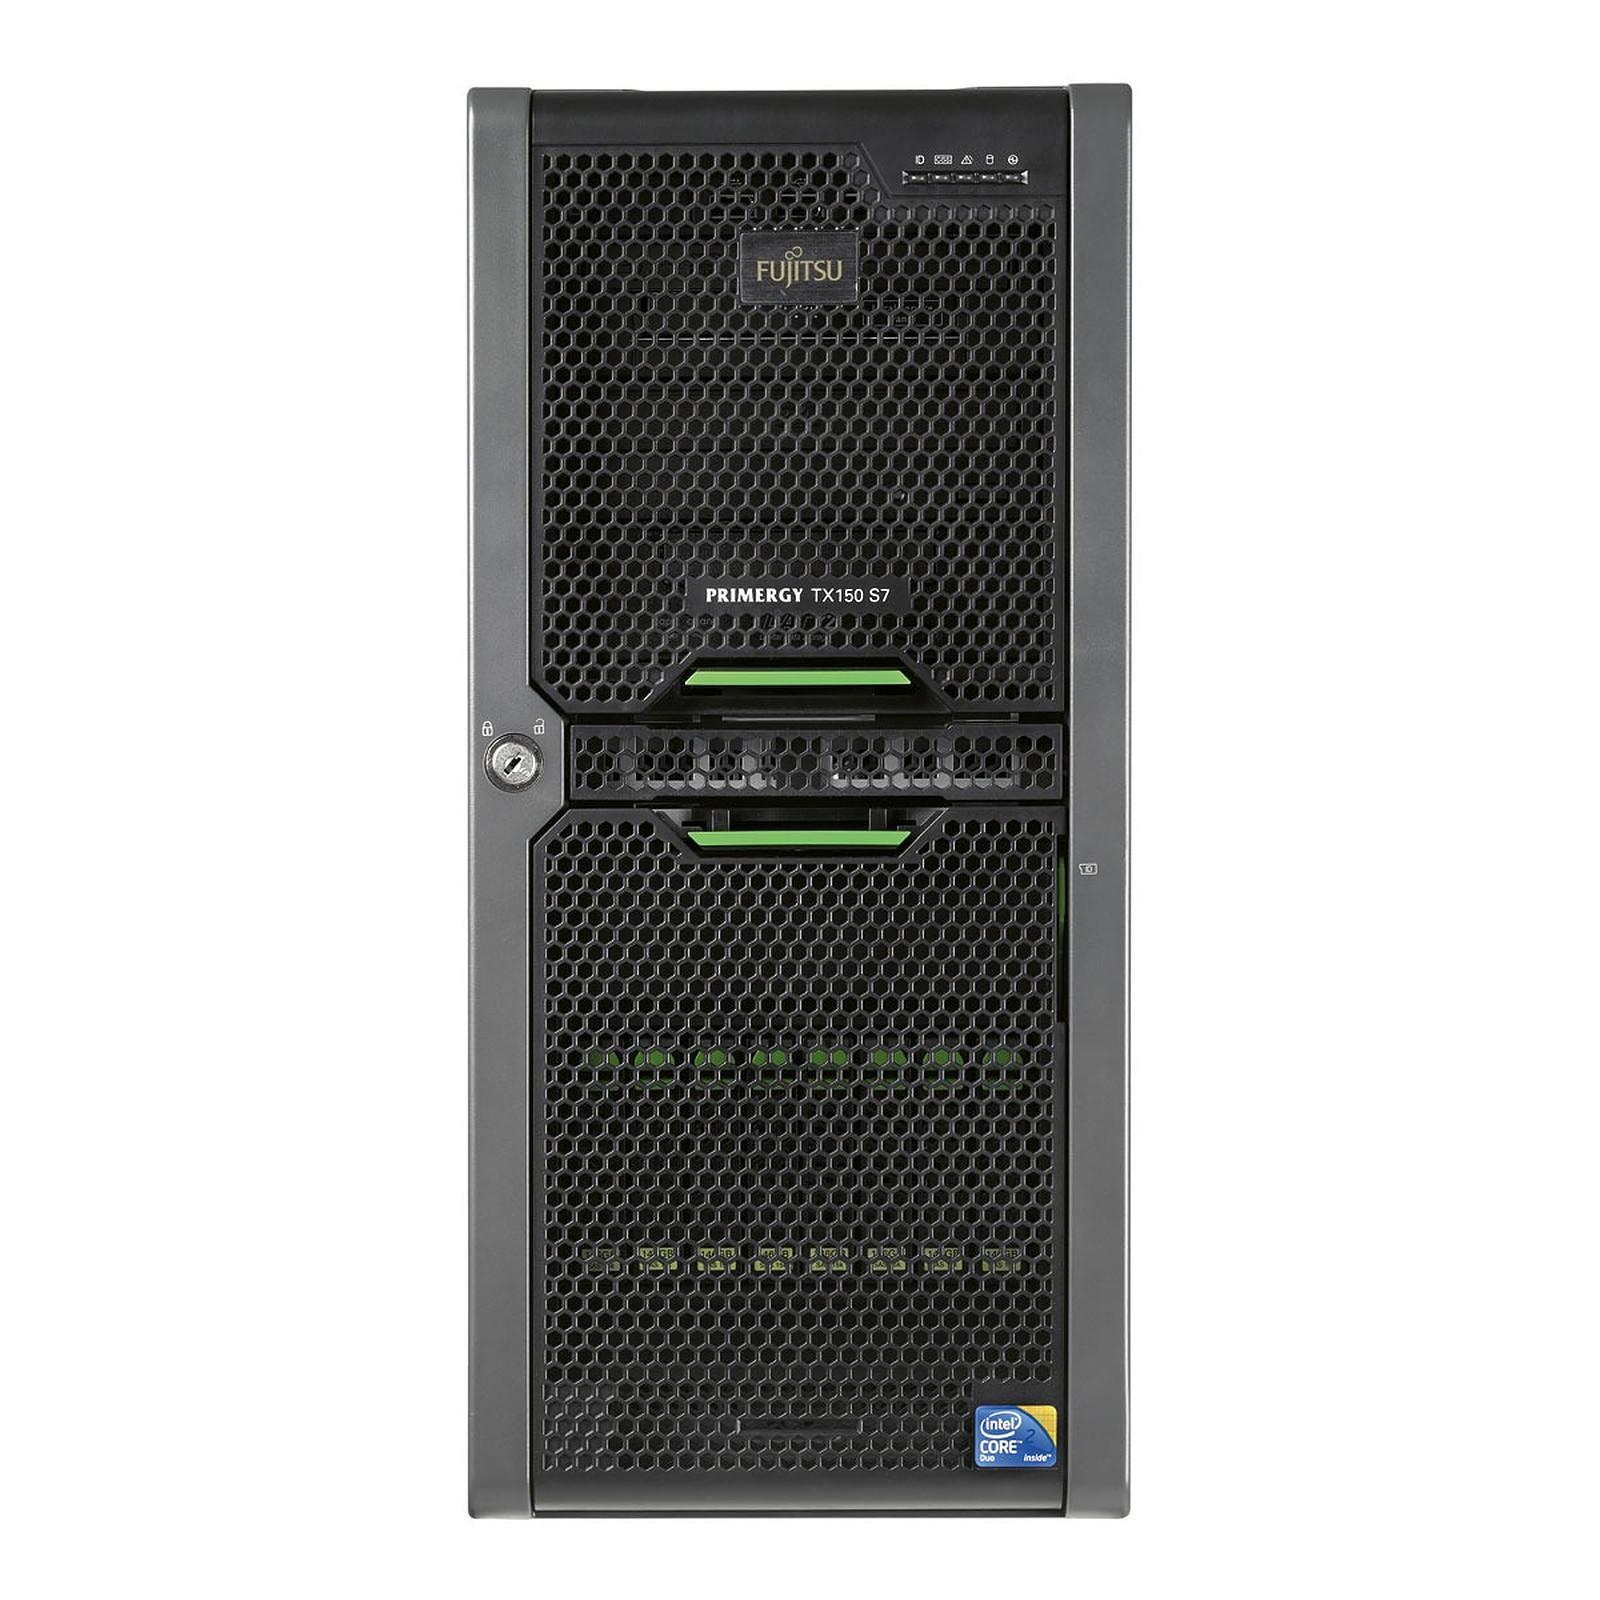 Fujitsu PRIMERGY TX150 S7